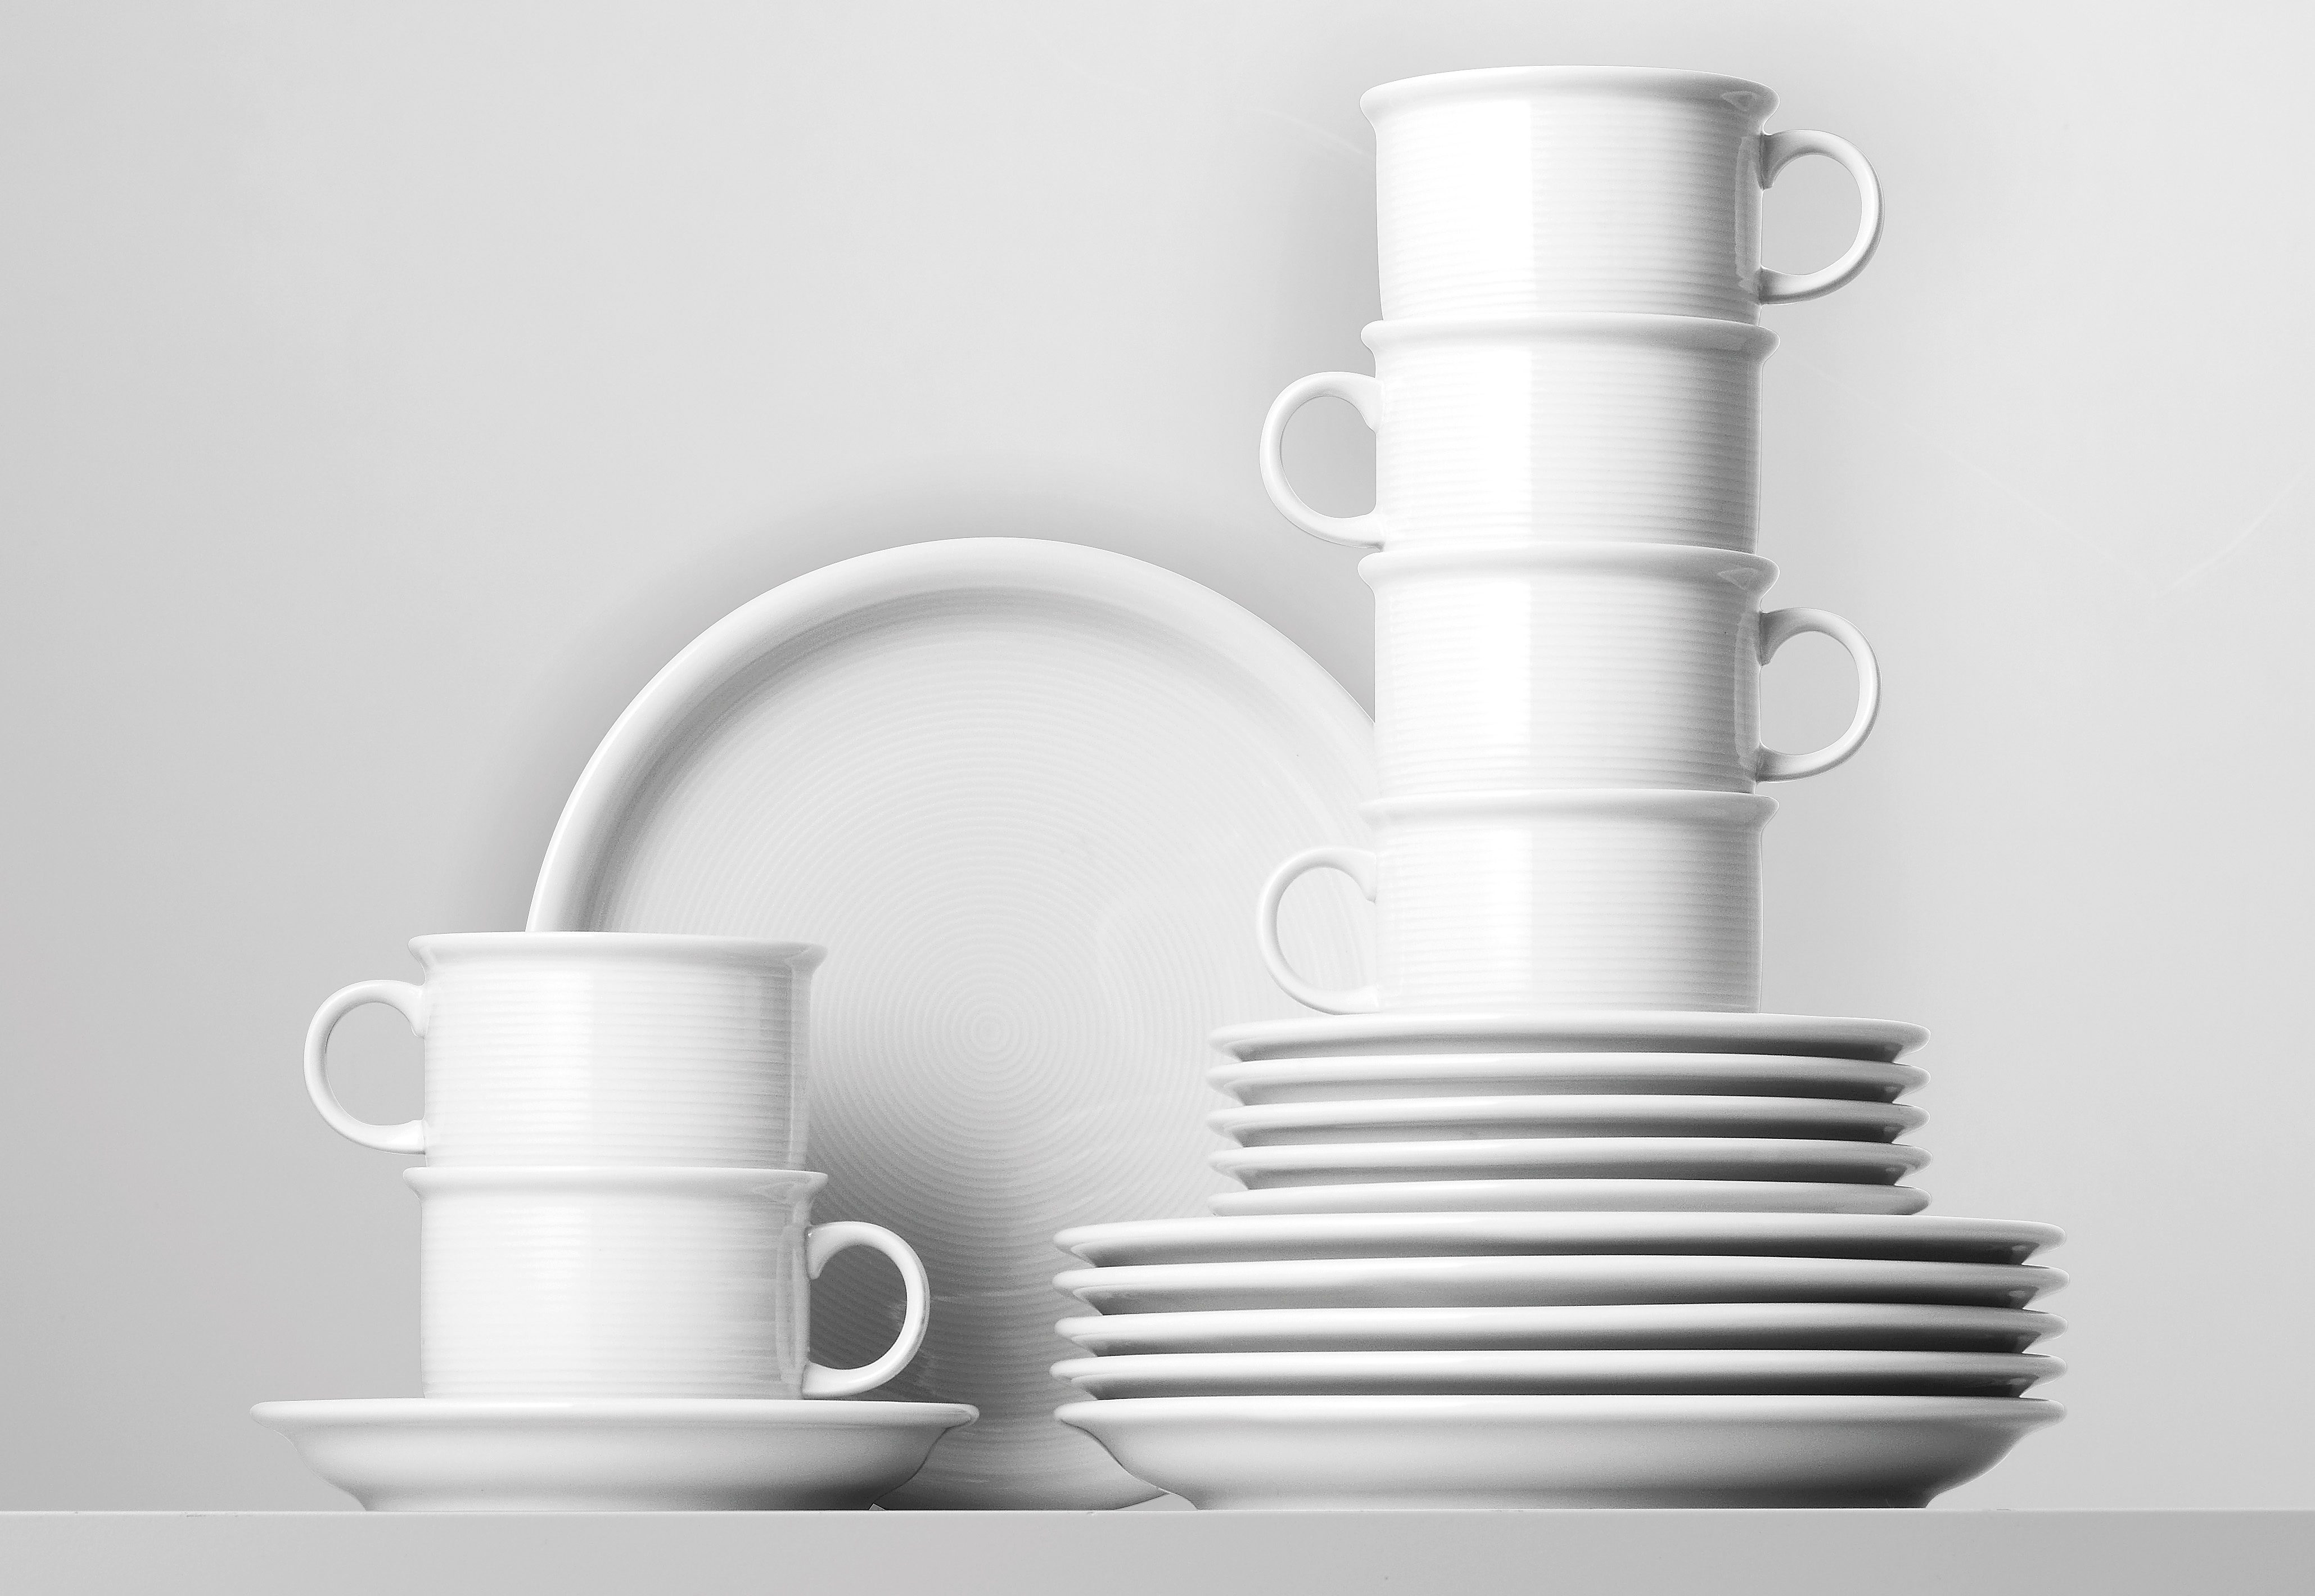 Thomas Porzellan Kaffeeservice Trend, (Set, 18 tlg.), Mikrowellengeeignet weiß Geschirr-Sets Geschirr, Tischaccessoires Haushaltswaren